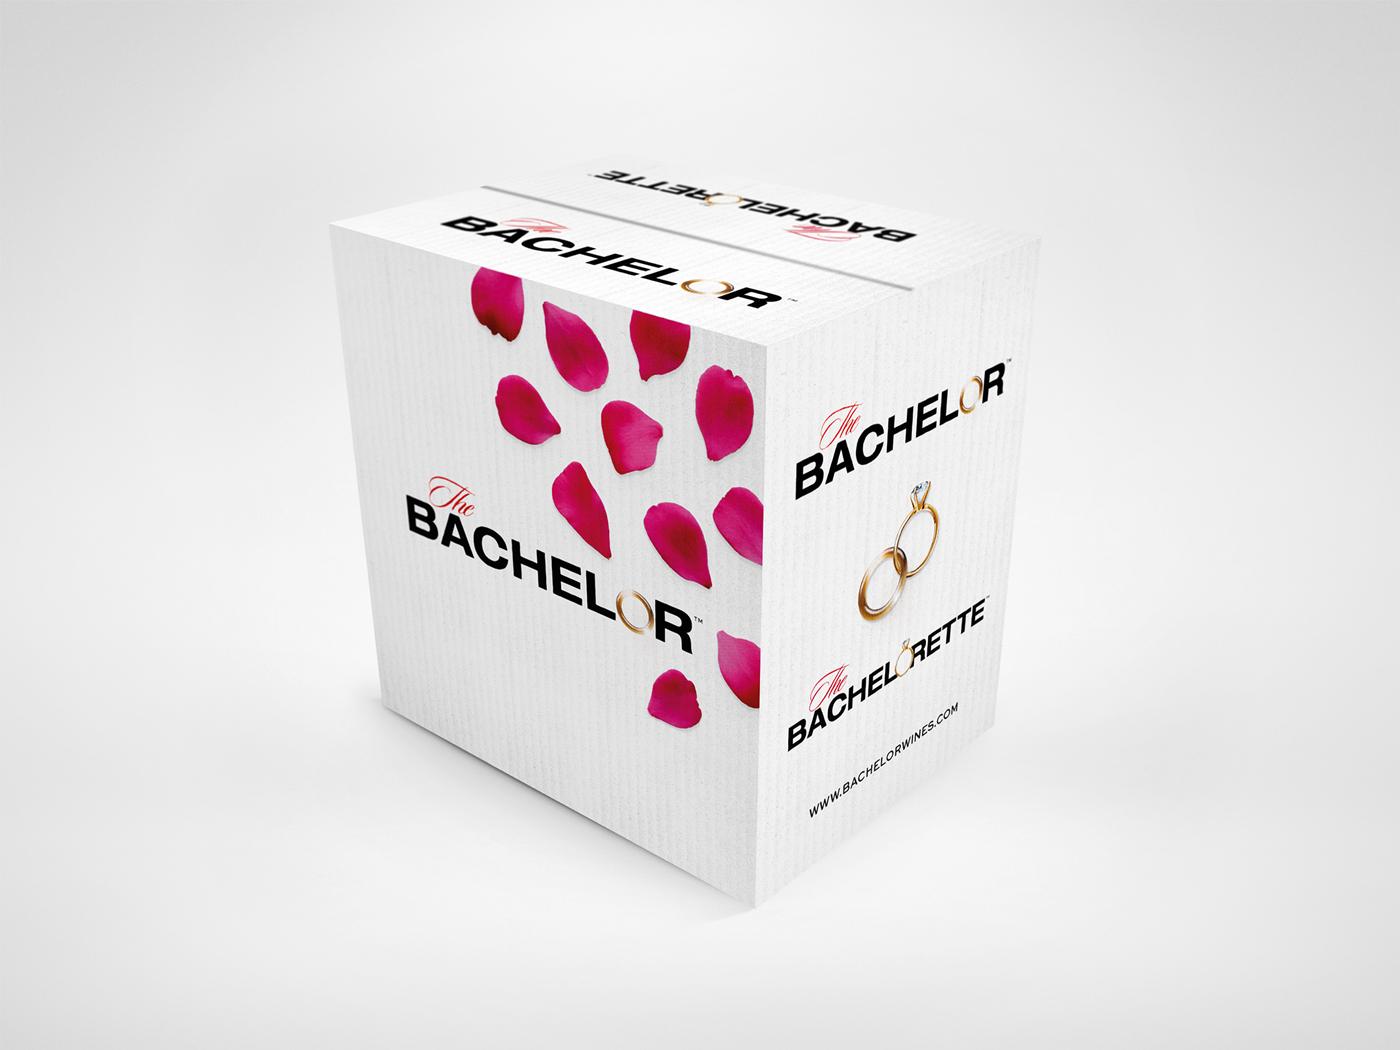 Bachelor Wines - Bachelor Wine Shipper